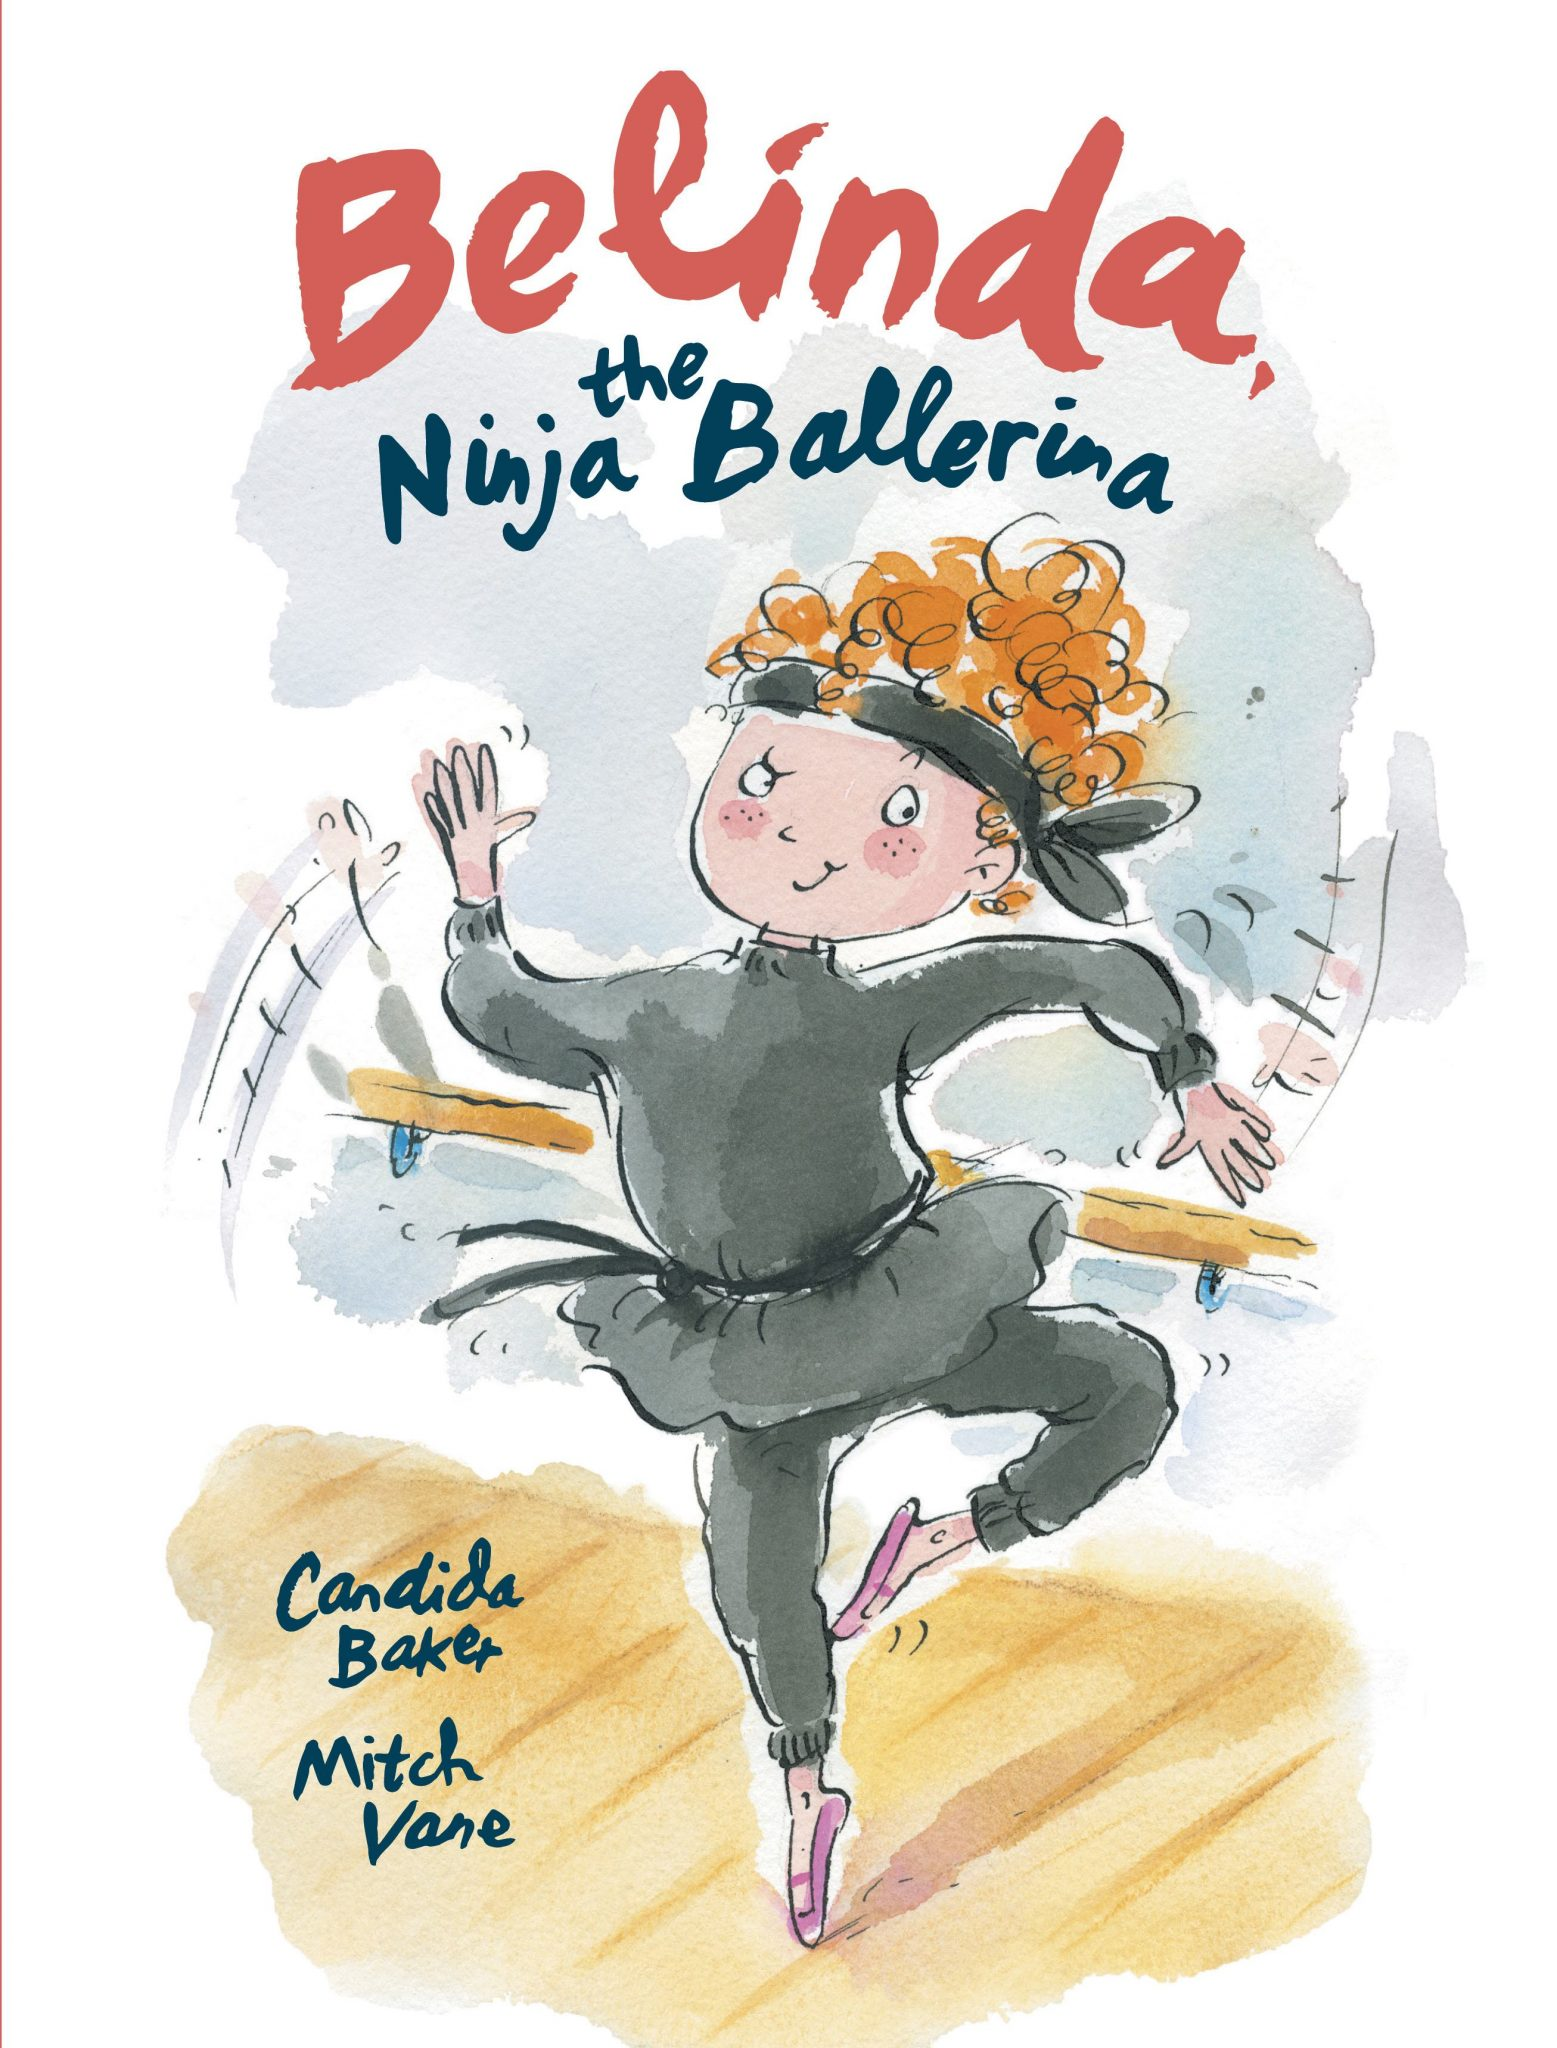 Belinda the Ninja Ballerina - Mitch Vane